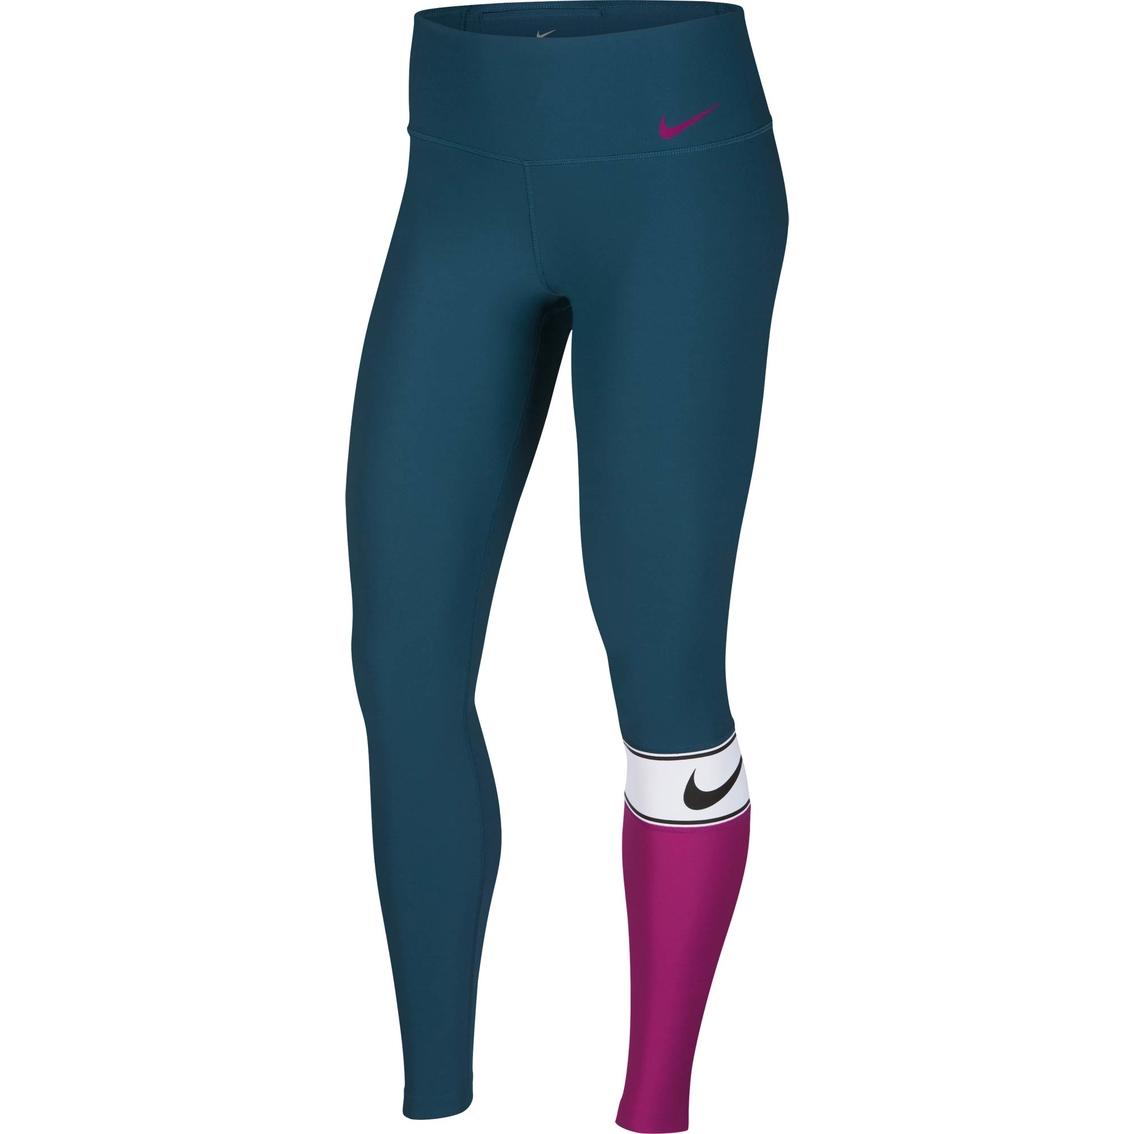 72579a561fc8c Nike Power Colorblock Training Tights   Pants & Capris   Apparel ...